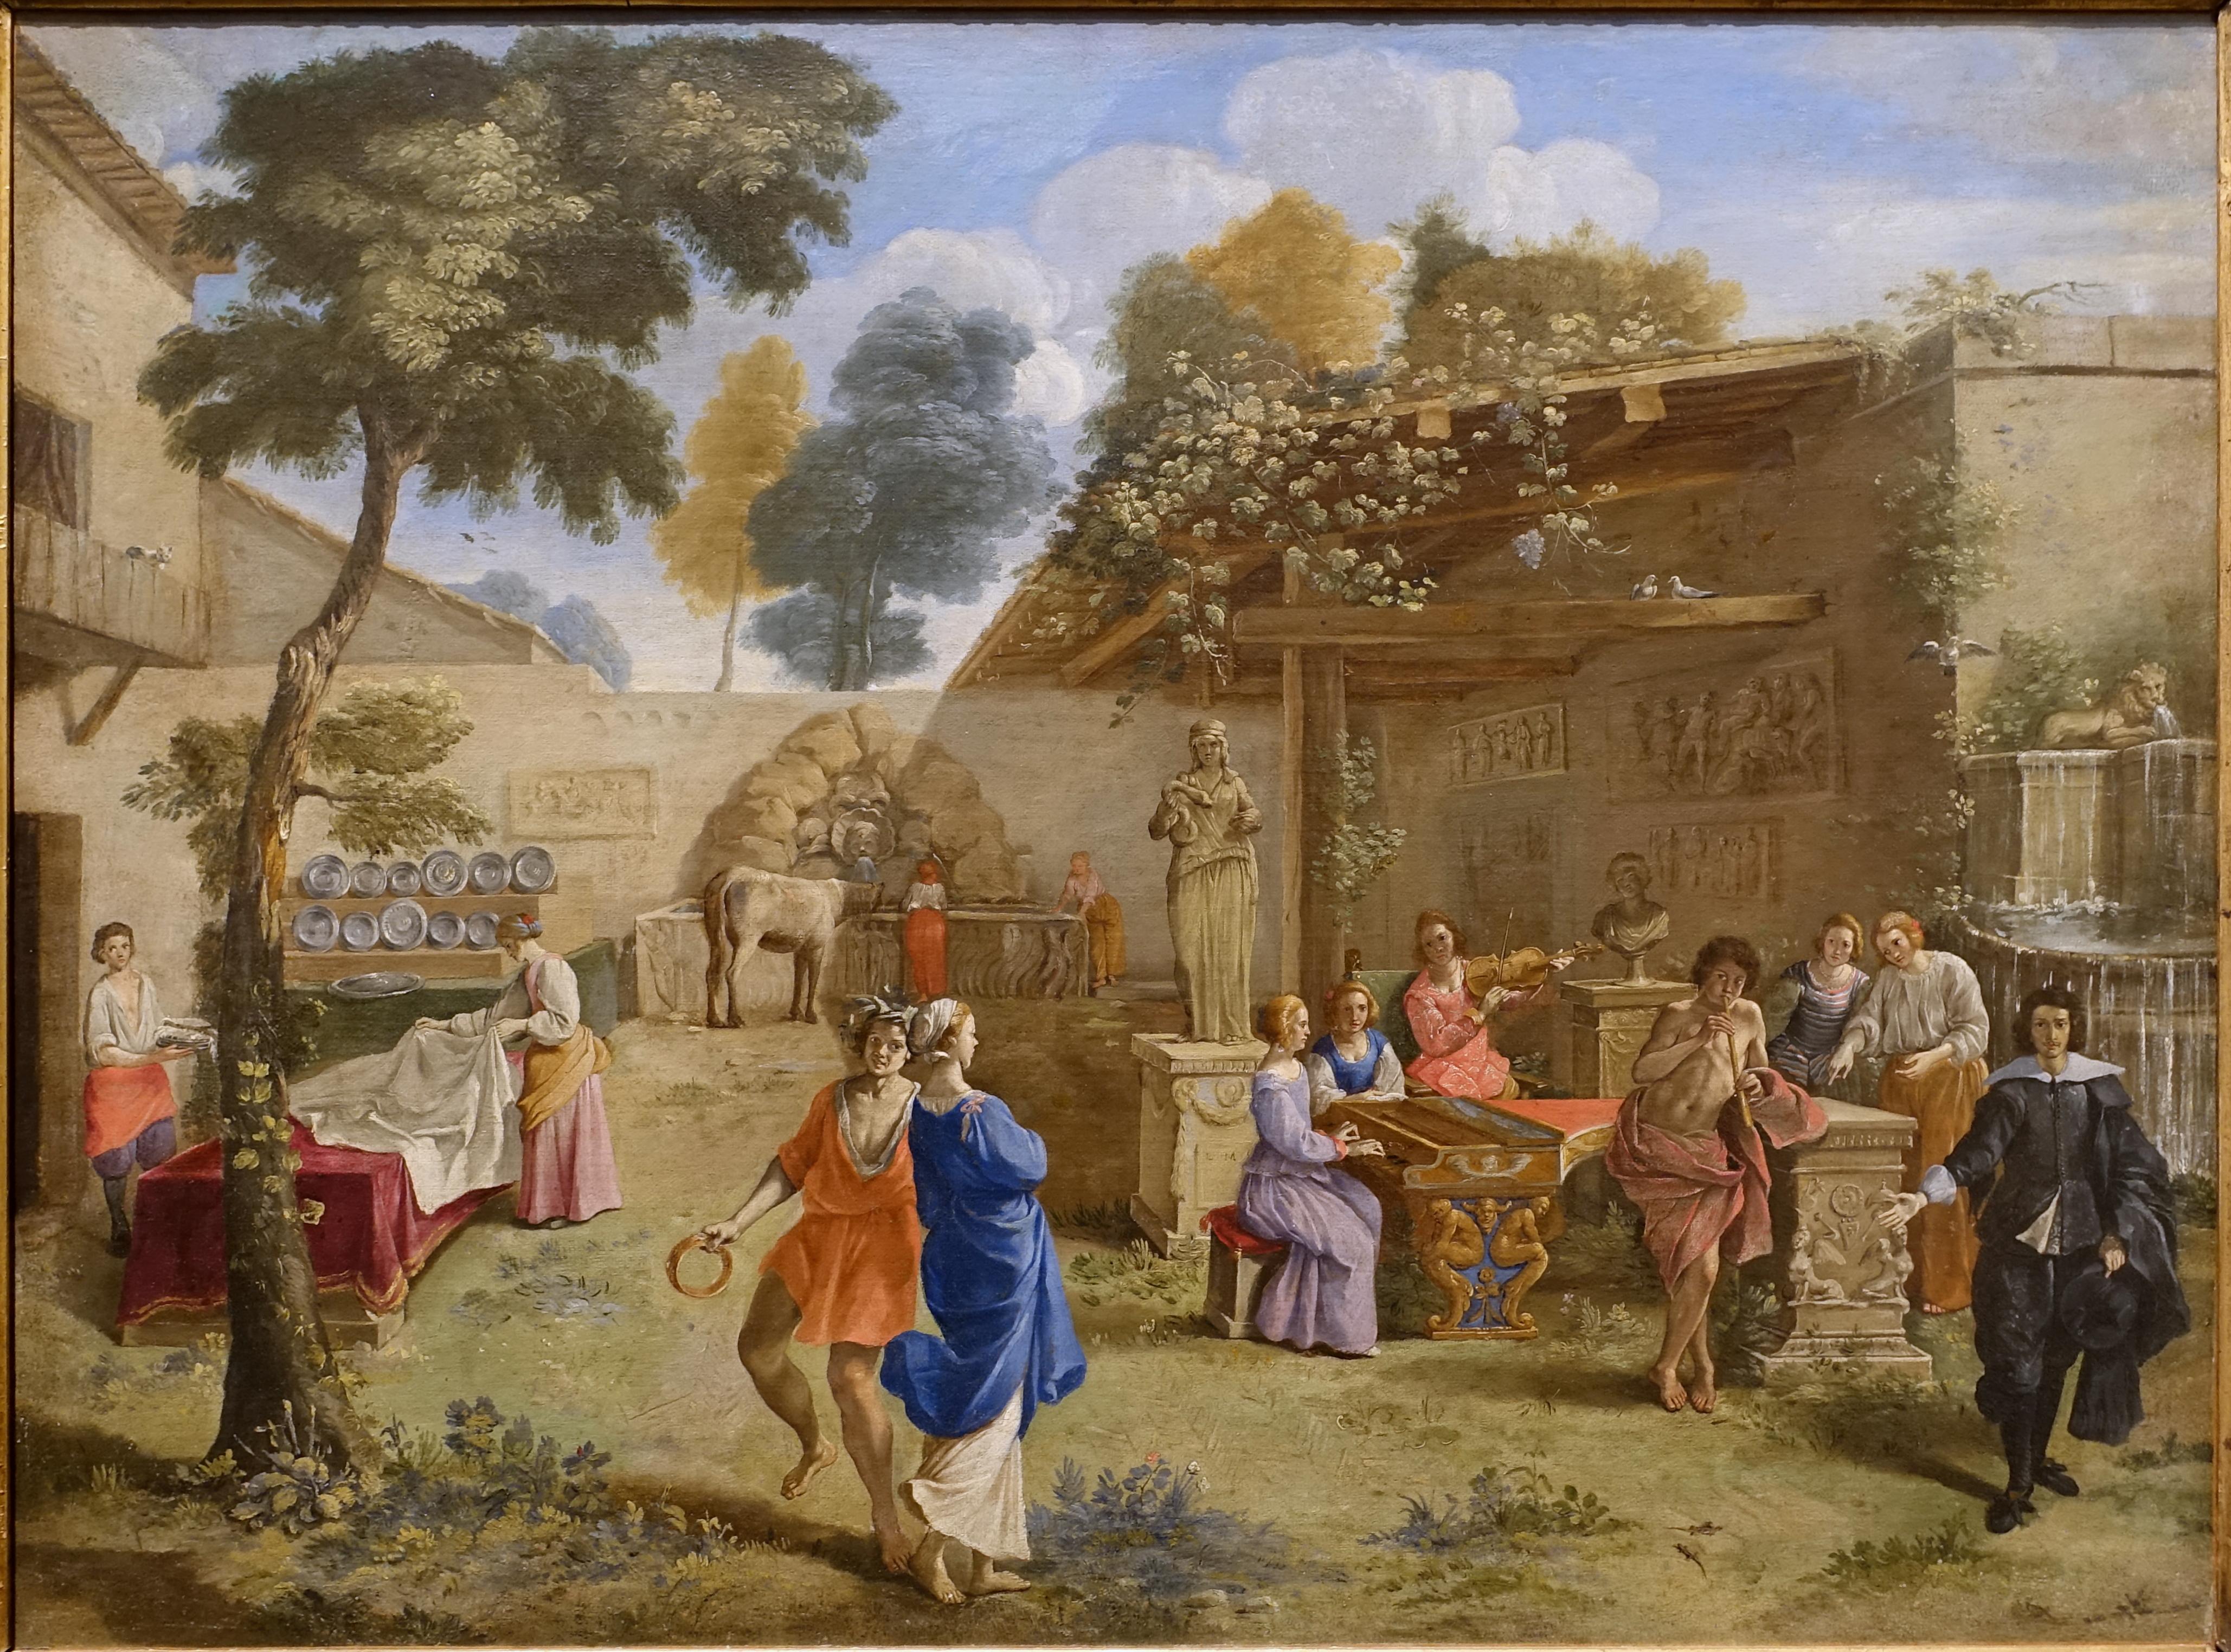 File:Musical Party in a Garden, by Giovanni Battista Passeri, 1640s ...